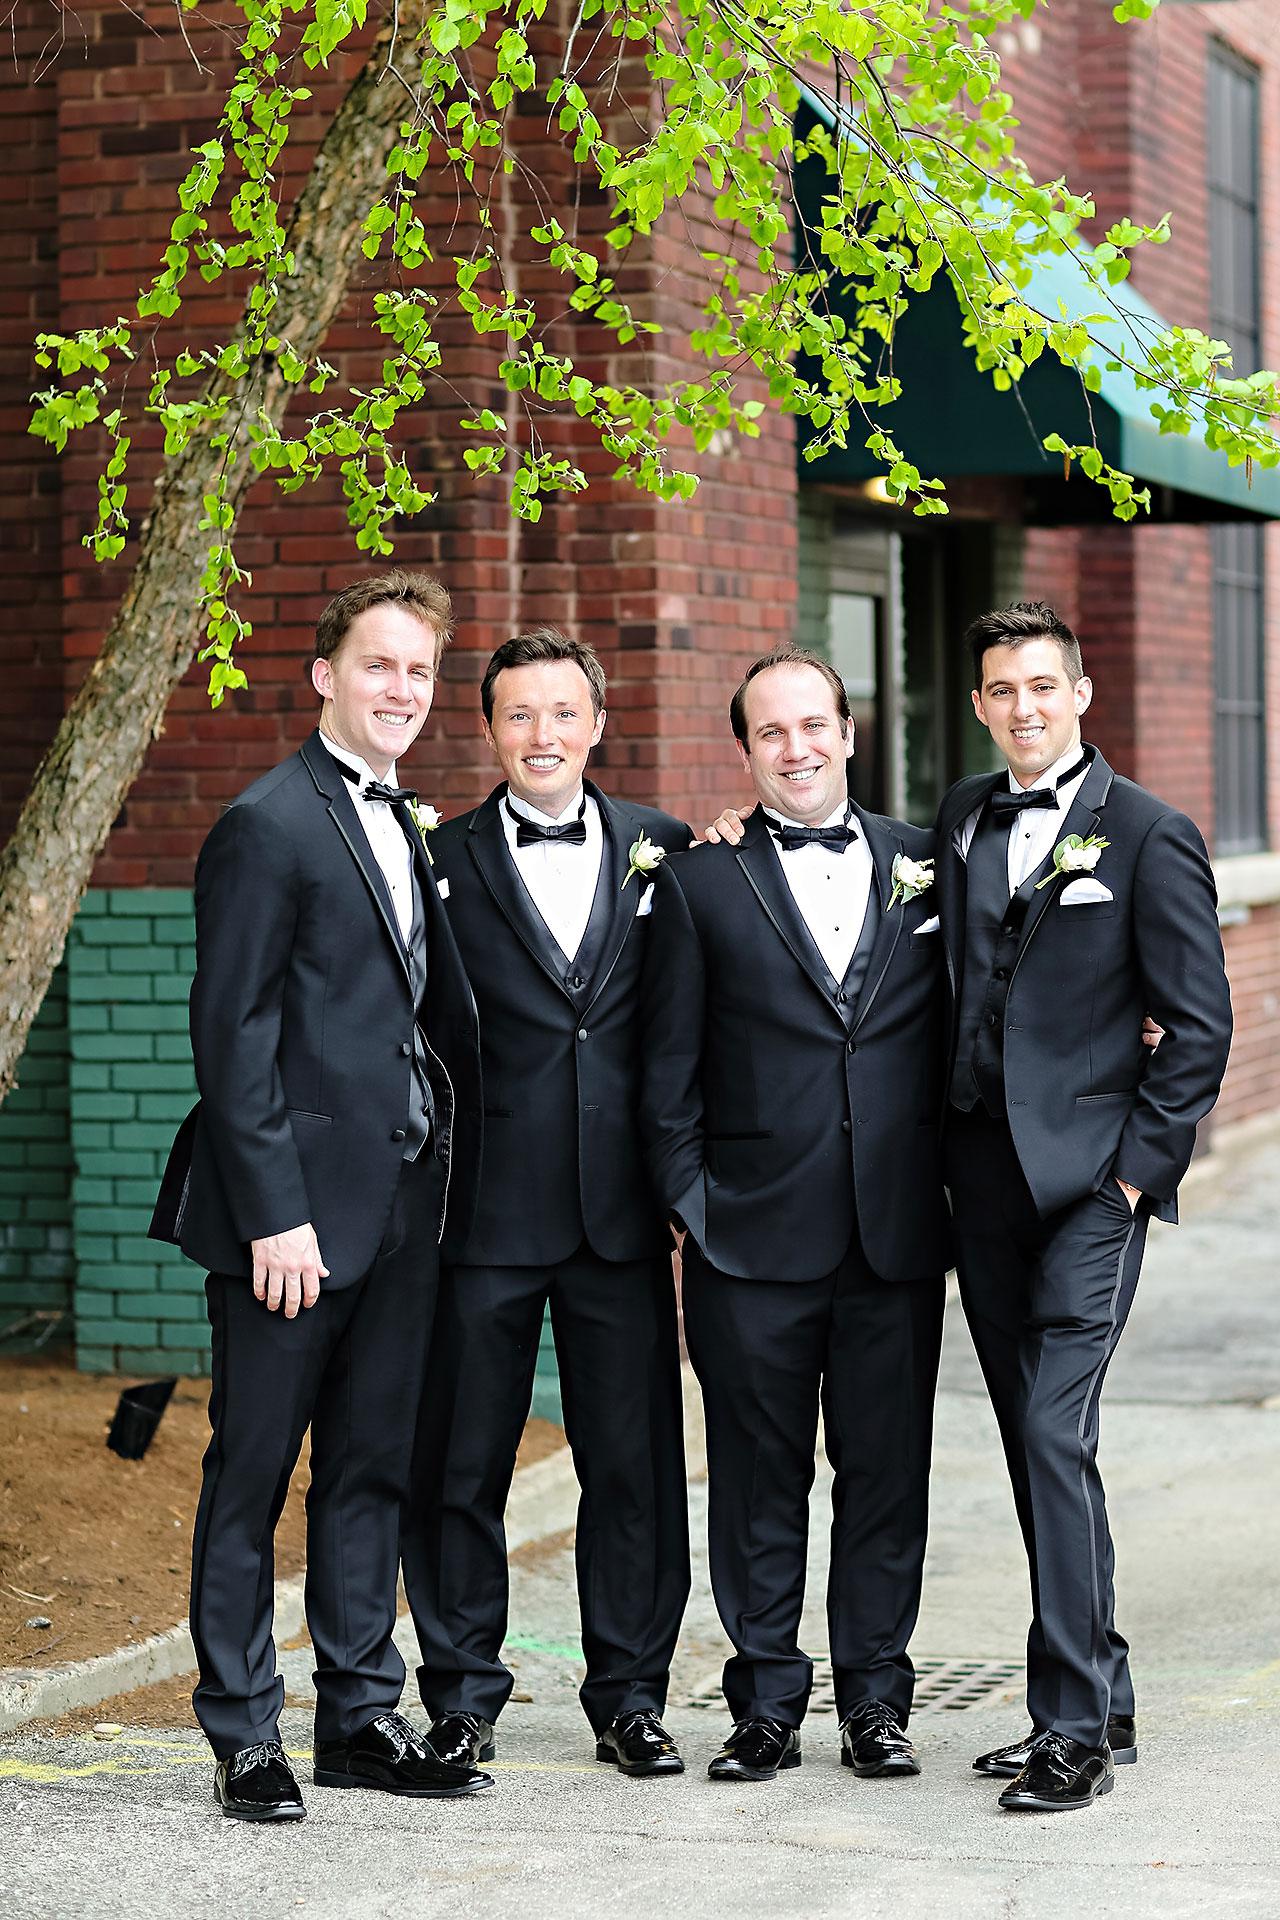 Allison Jeff Union Station Crowne Plaza Indianapolis wedding 146